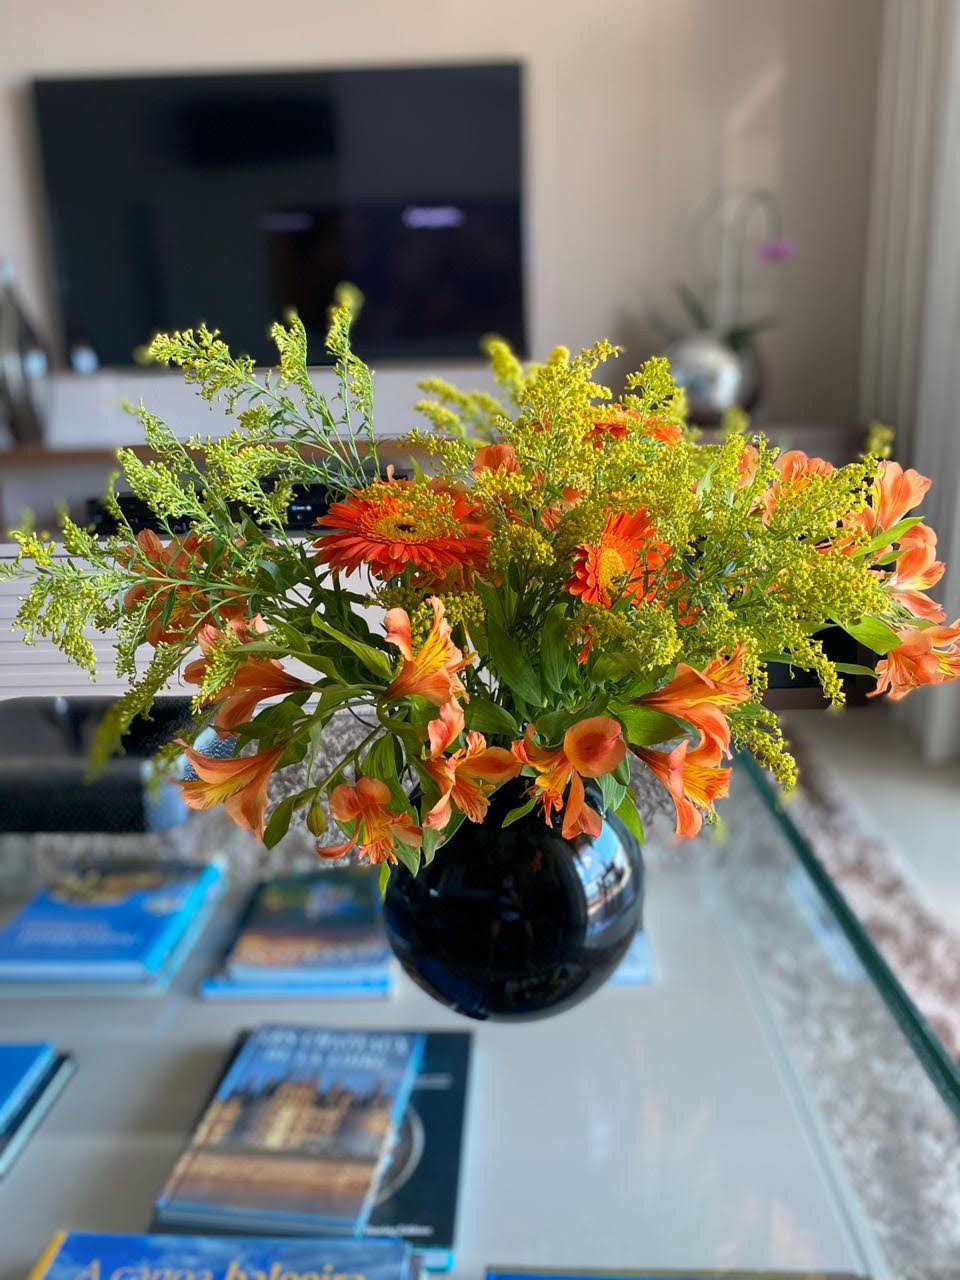 Vaso preto com flores laranjas